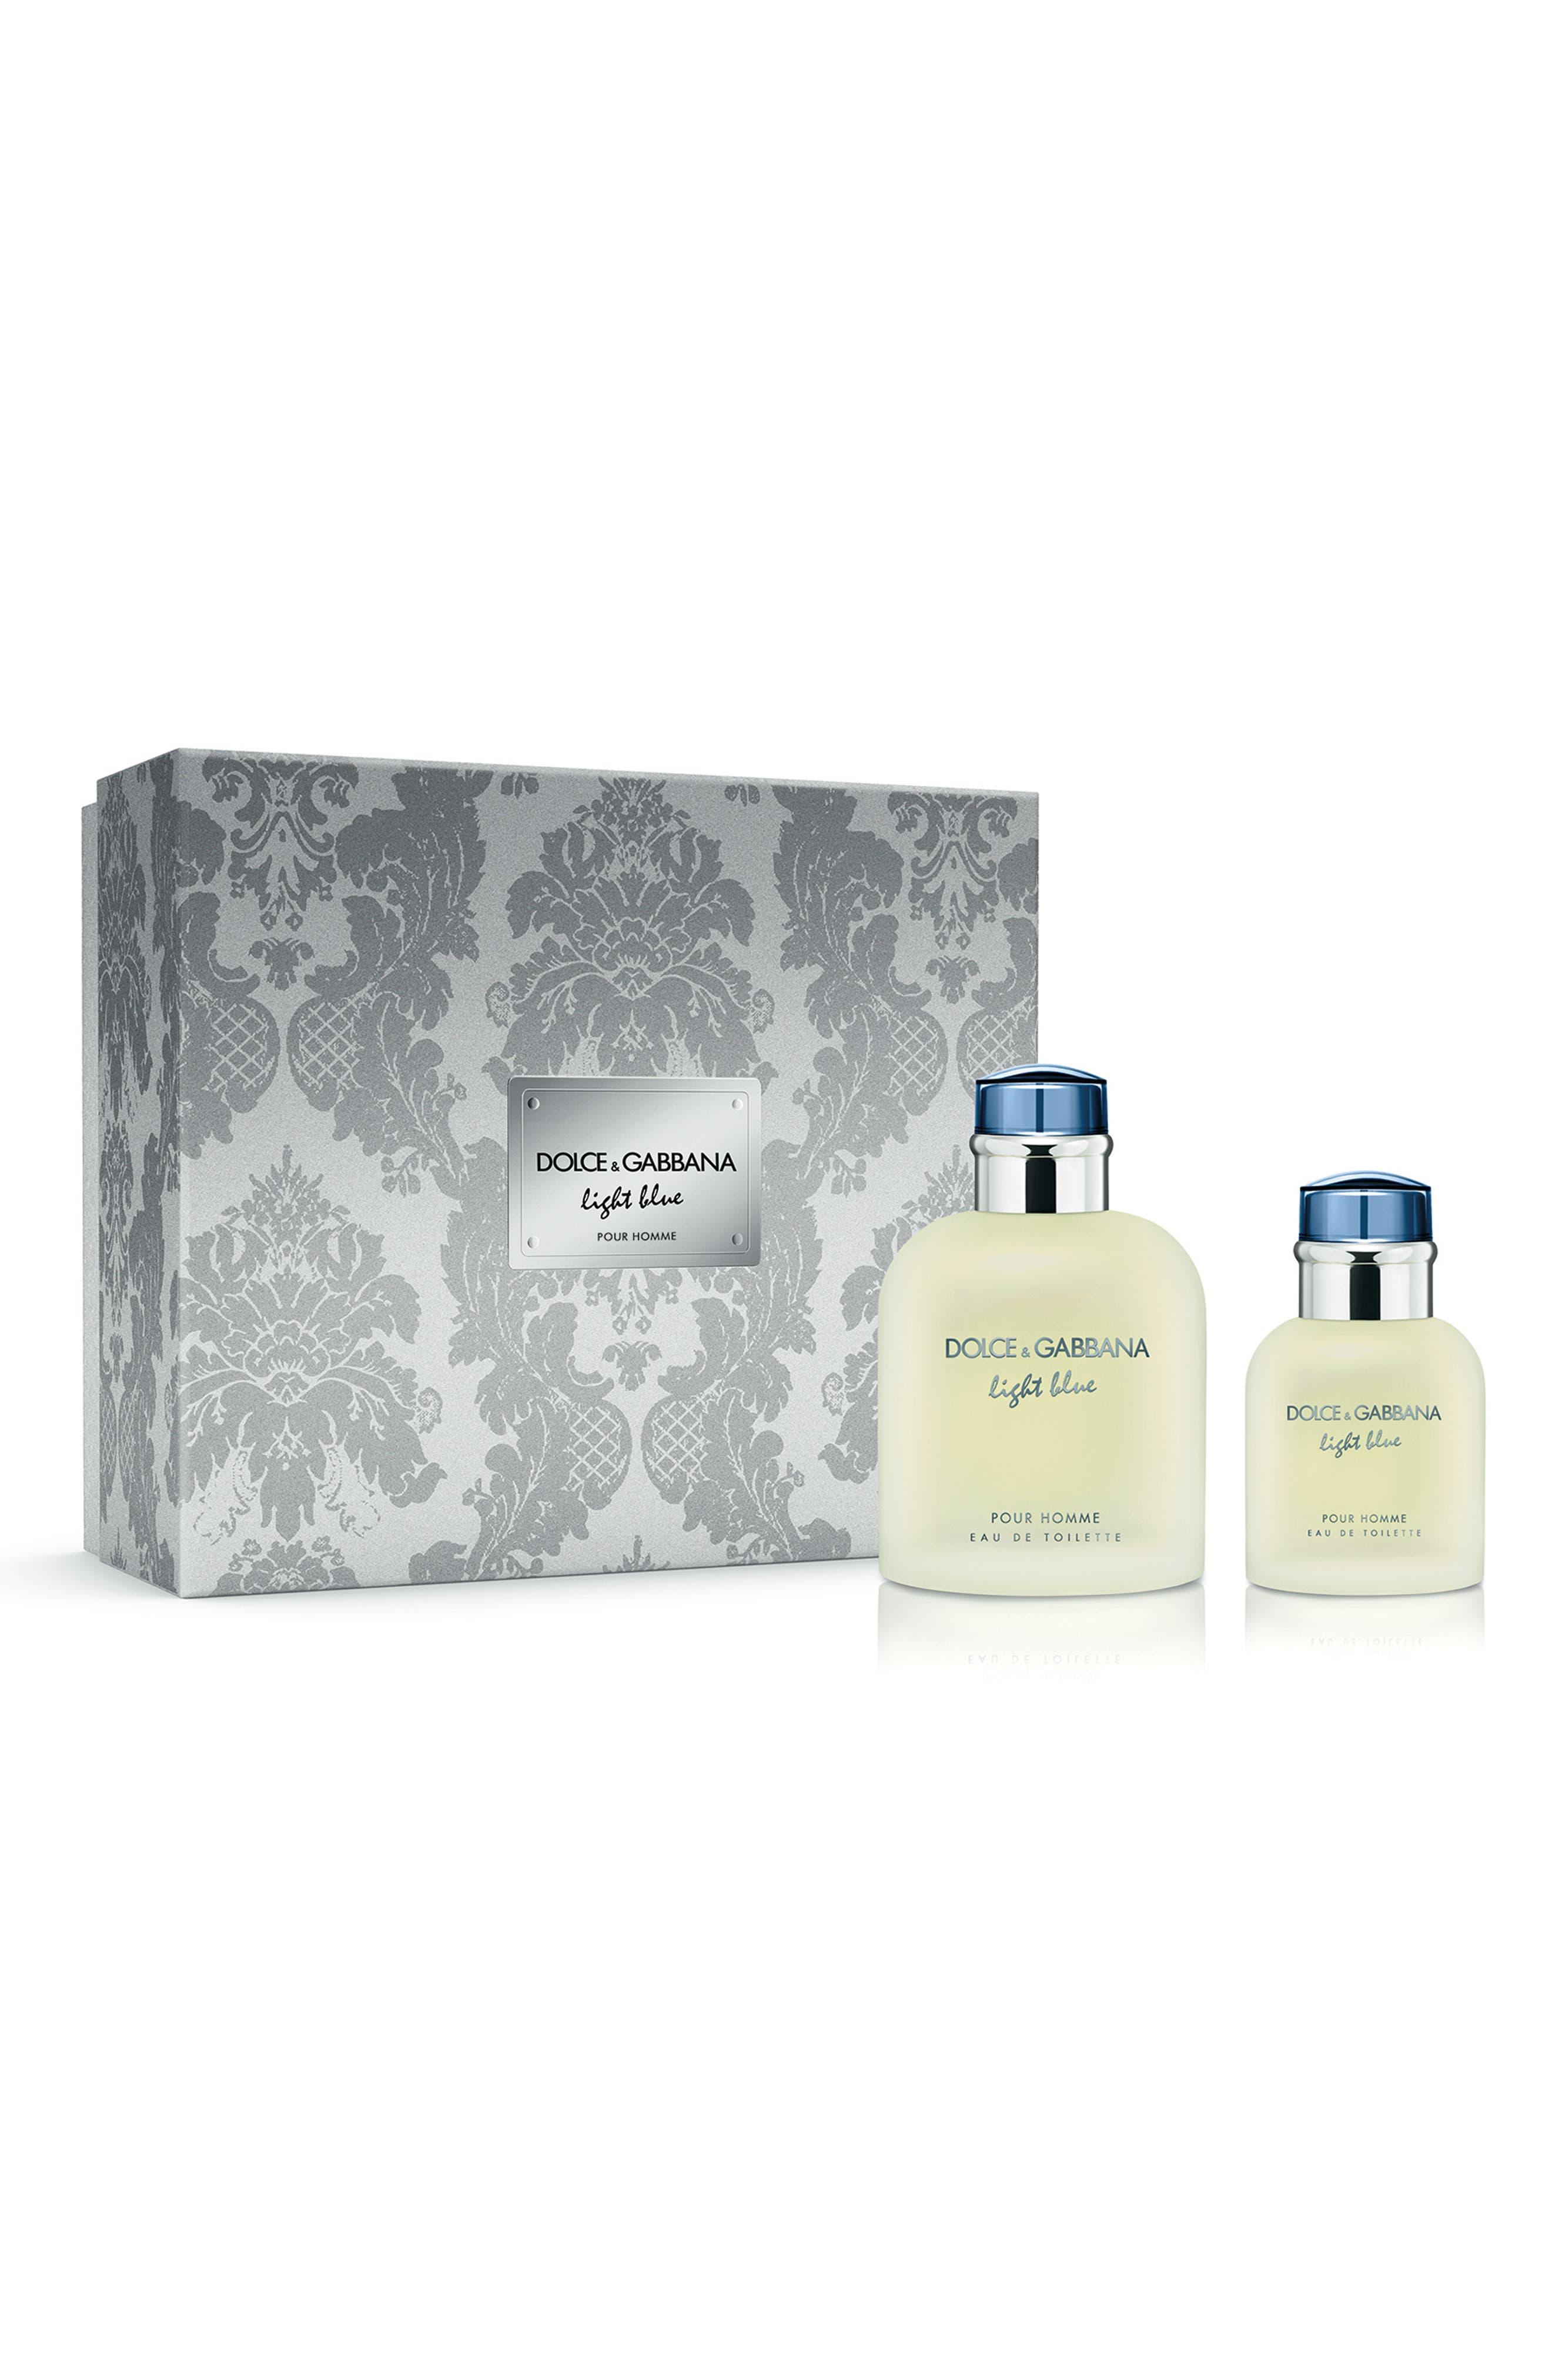 ebc72bb43d9a Dolce   Gabbana Men s Cologne   Fragrance